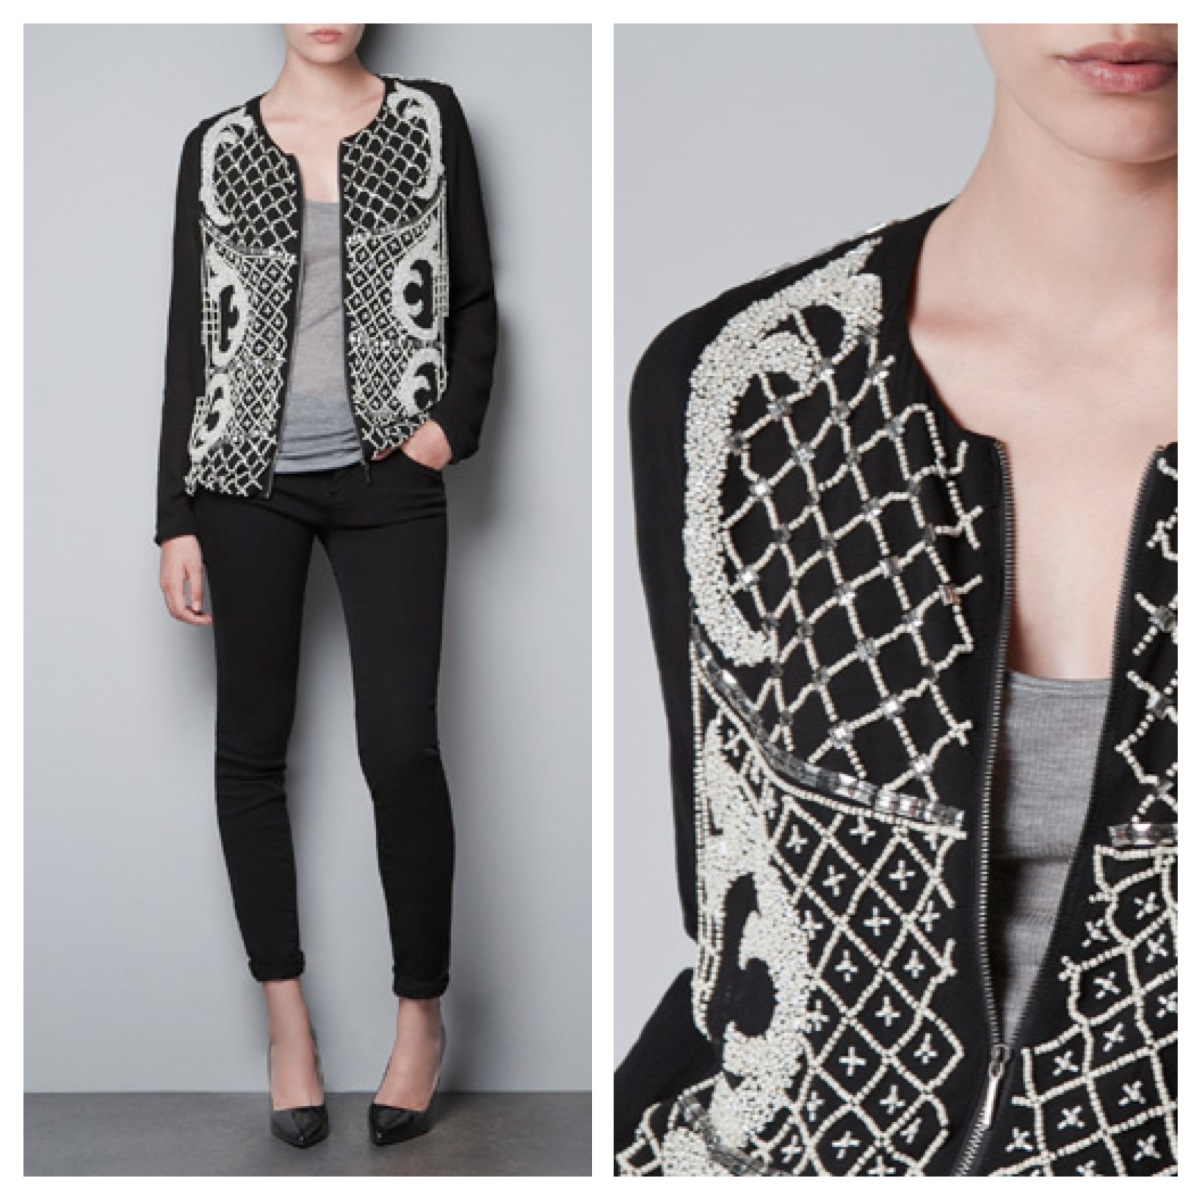 Zara clothing online shopping usa